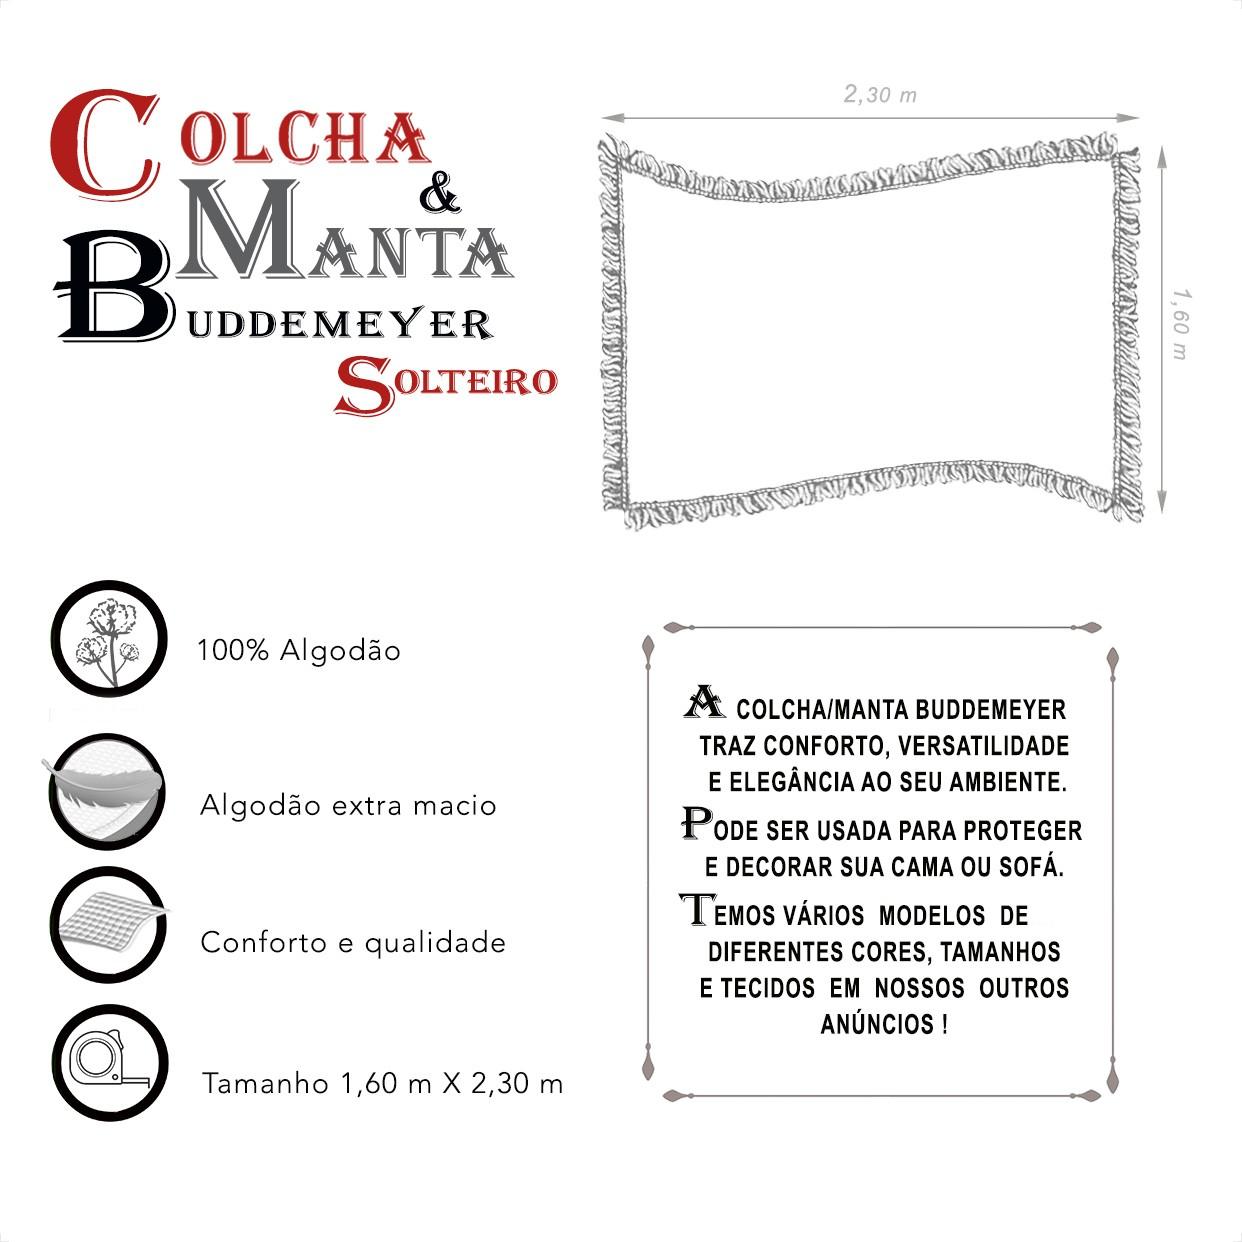 Manta e Colcha Buddemeyer Solteiro Rosa 1,60m x 2,30m